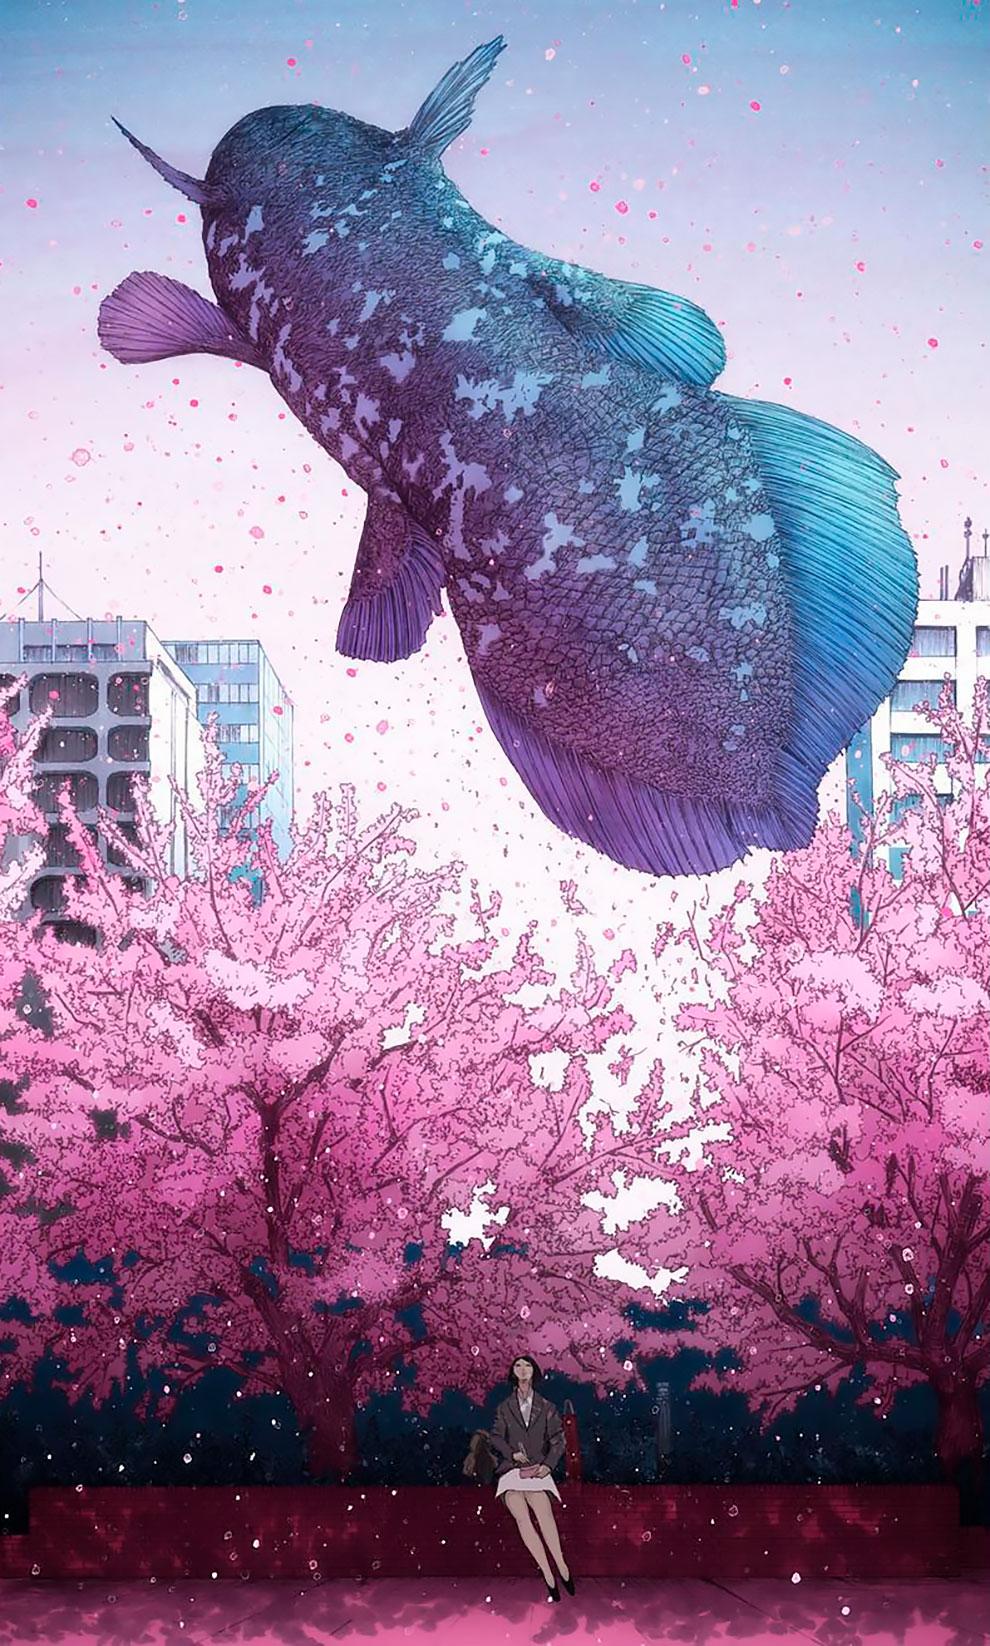 иллюстратор Хирому (1).jpg